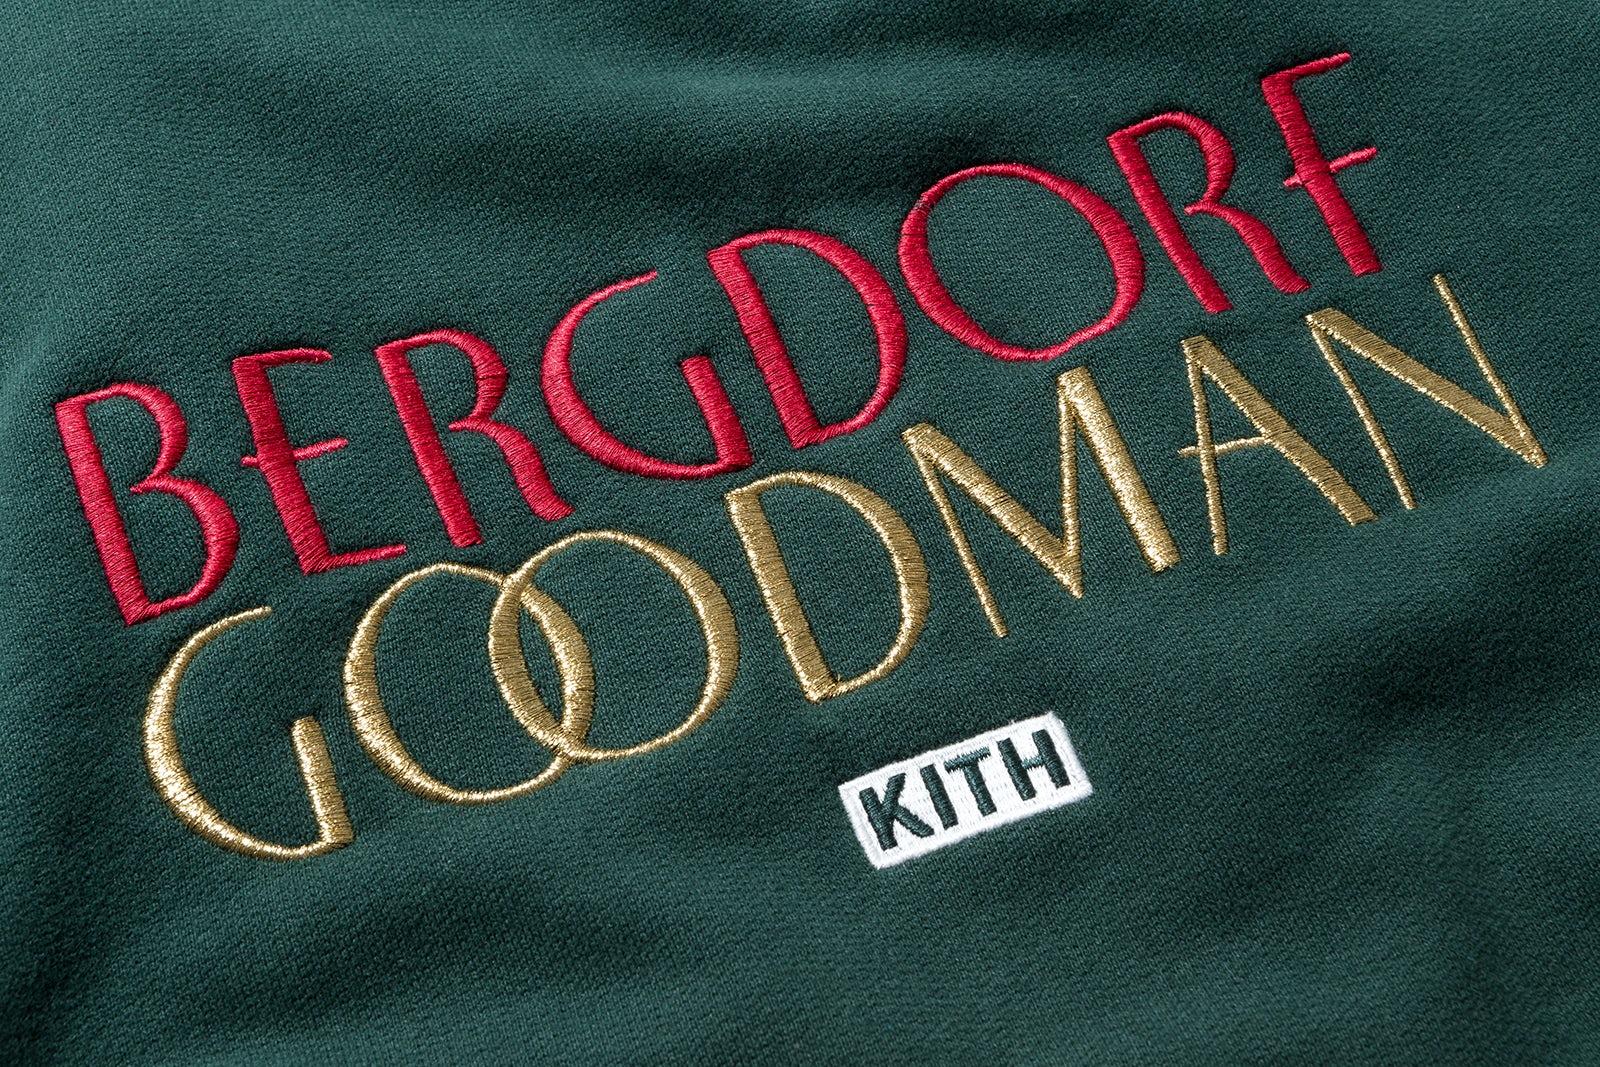 Bergdorf Goodman x Kith sweatshirt   Source: Kith